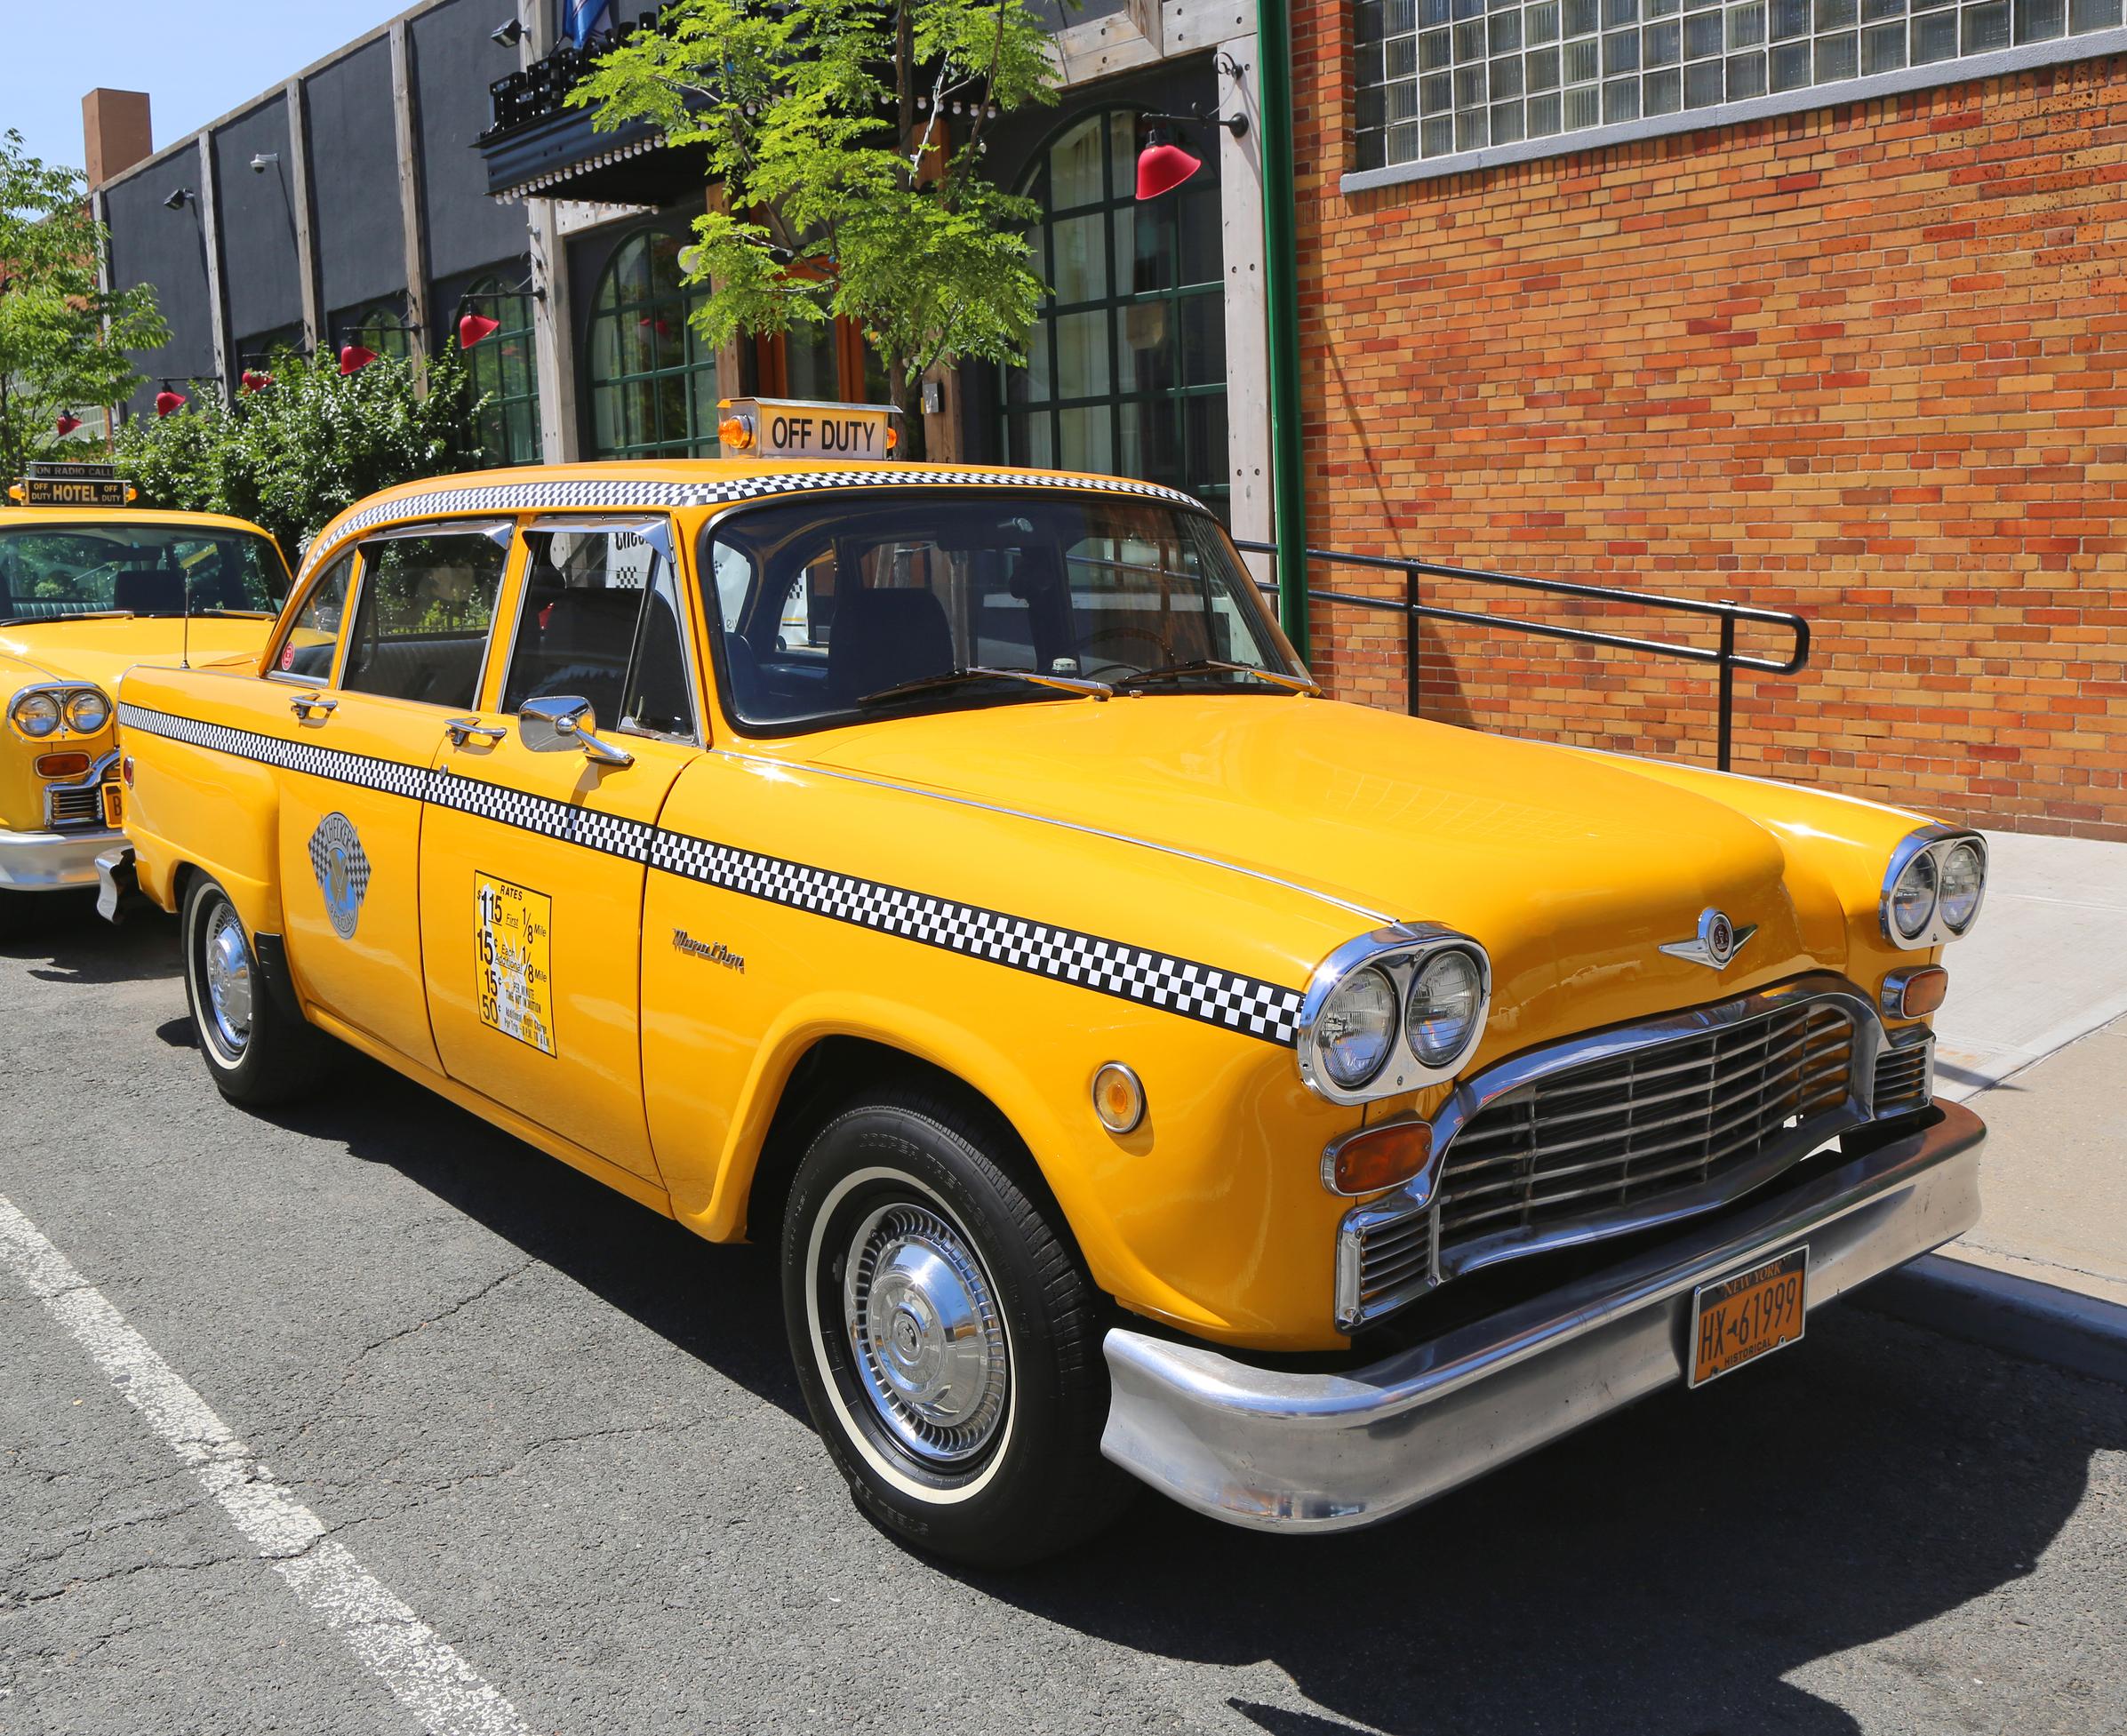 Dustbin of History: The Checker Cab